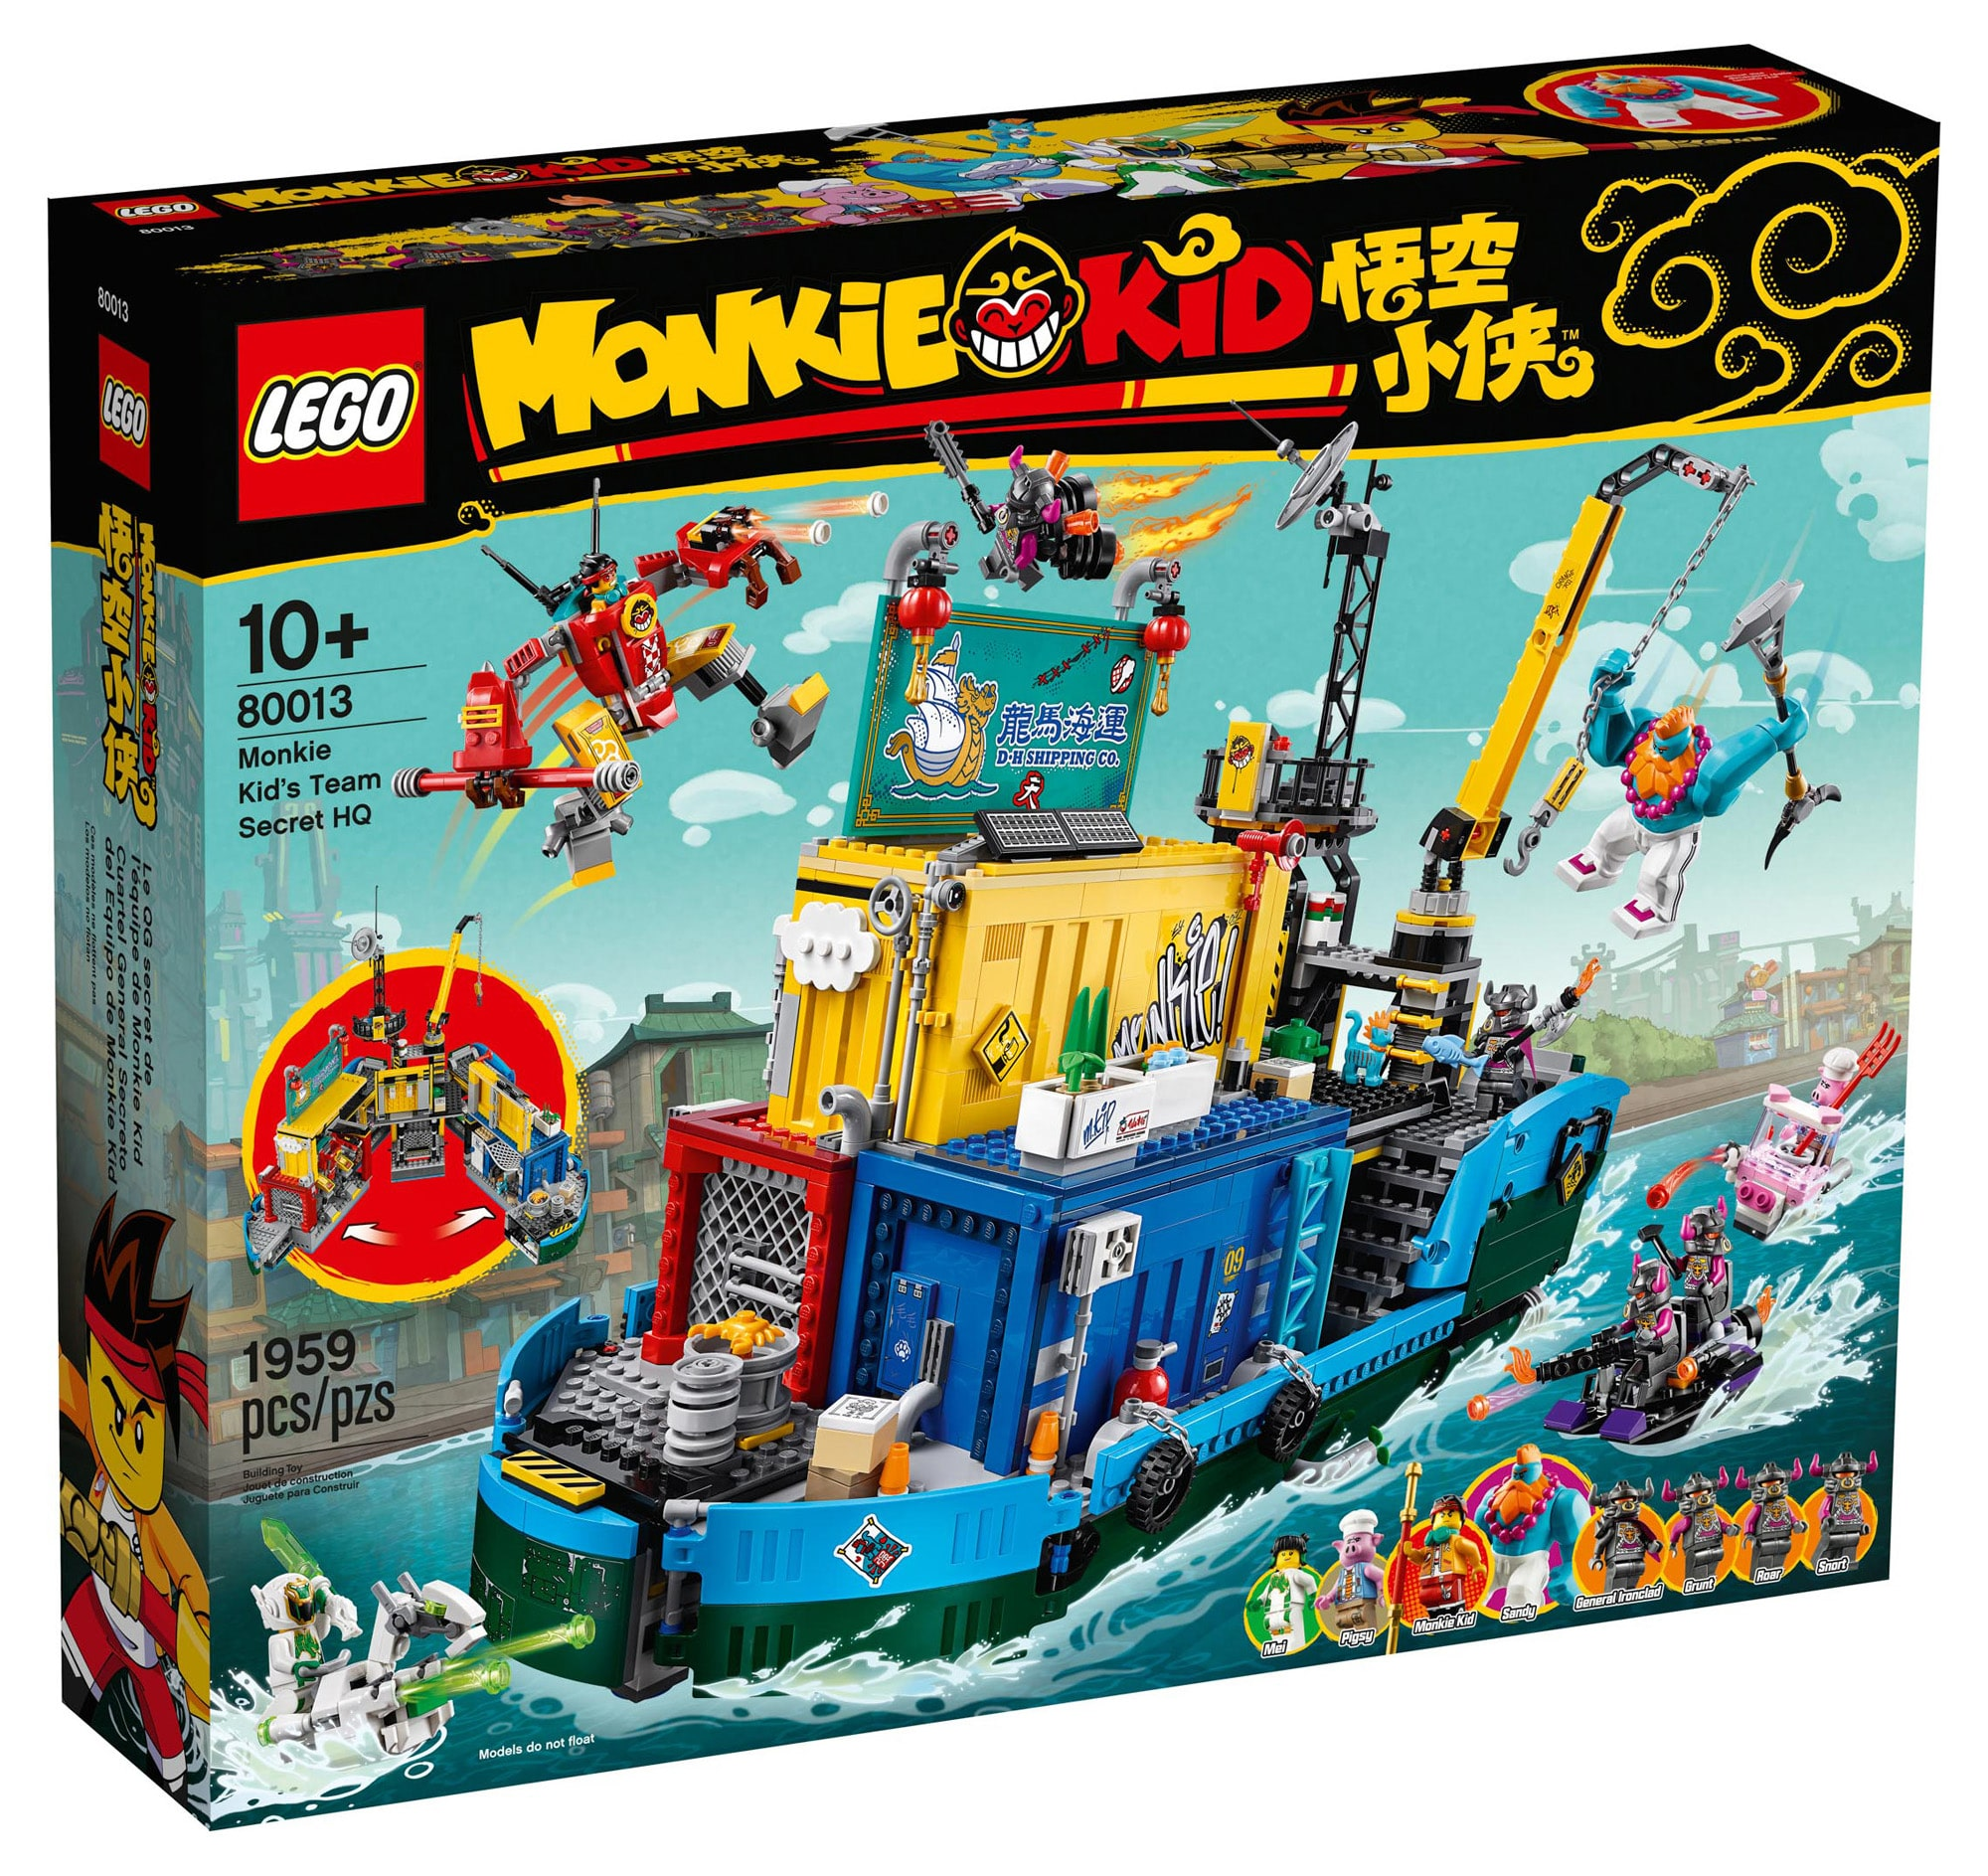 LEGO Monkie Kid 80013 Monkie Kids Team Secret Hq